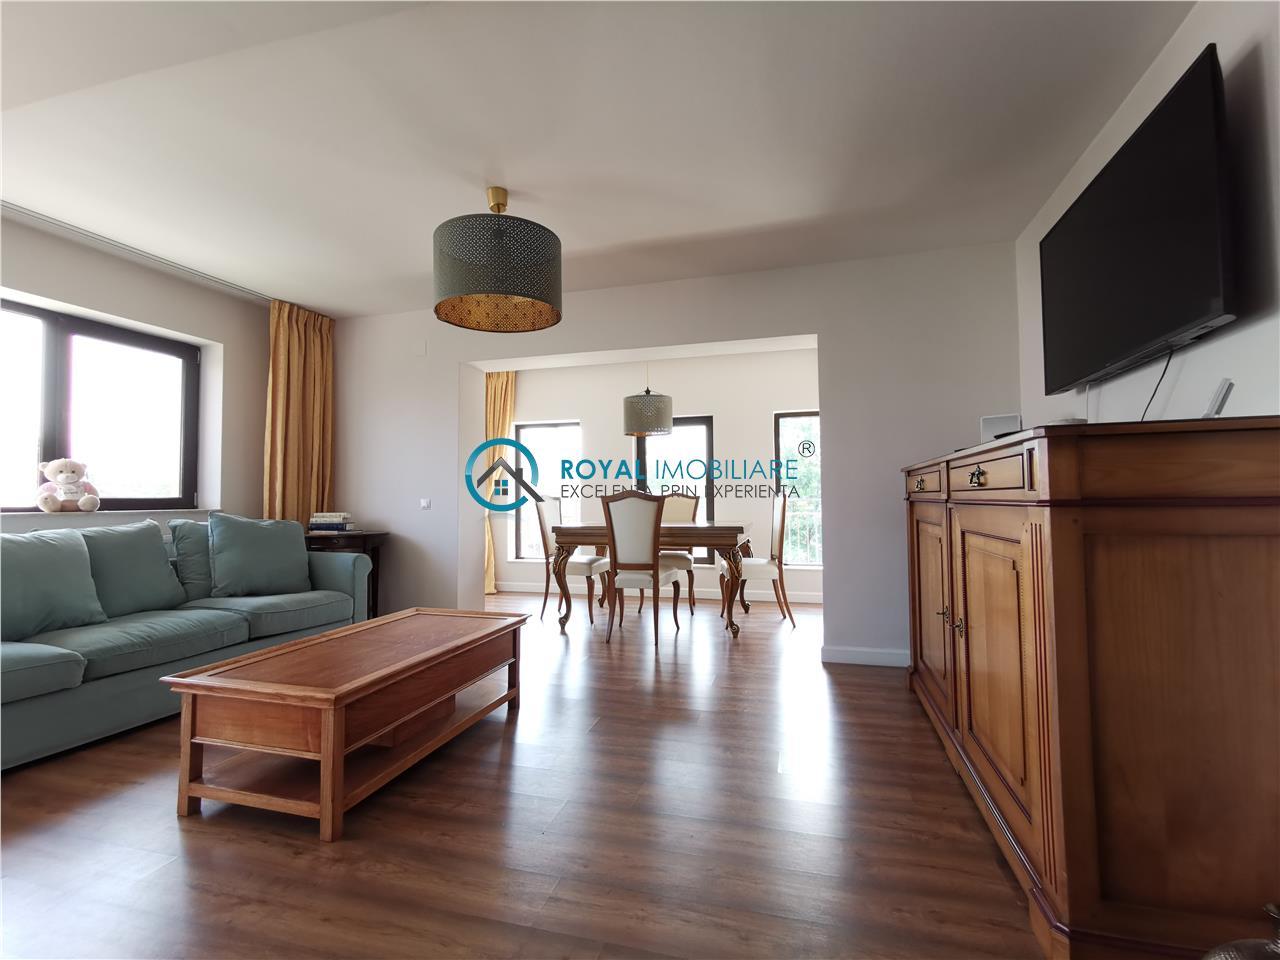 Royal Imobiliare   Inchirieri Apartamente Marasesti